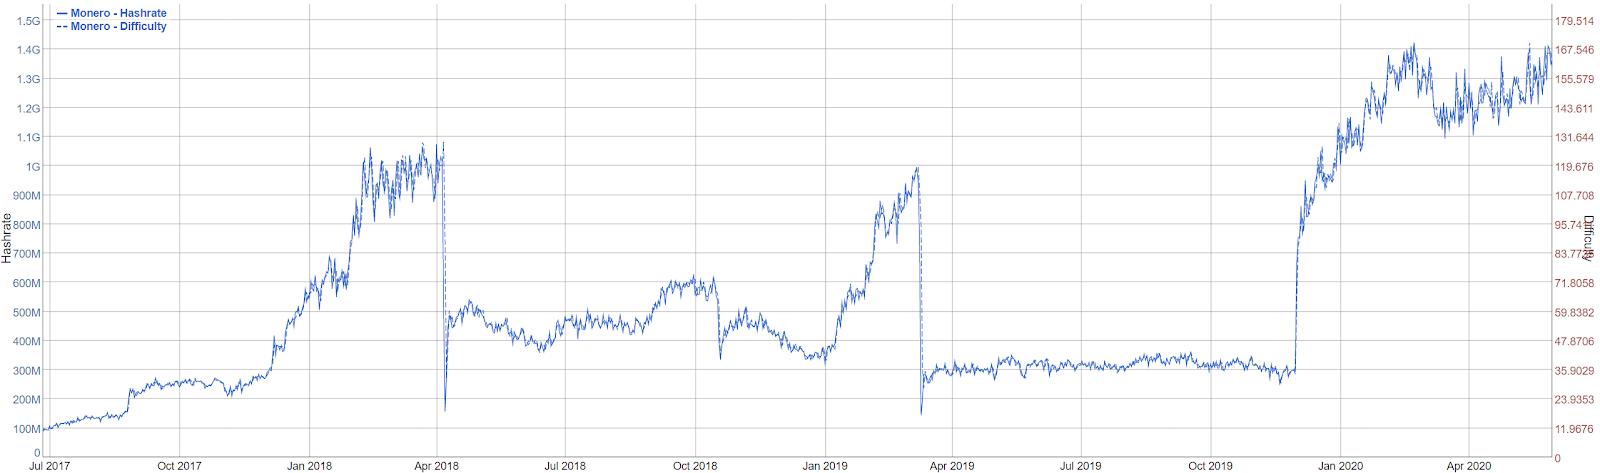 Monero Price Analysis 1 Jun 2020 (2)